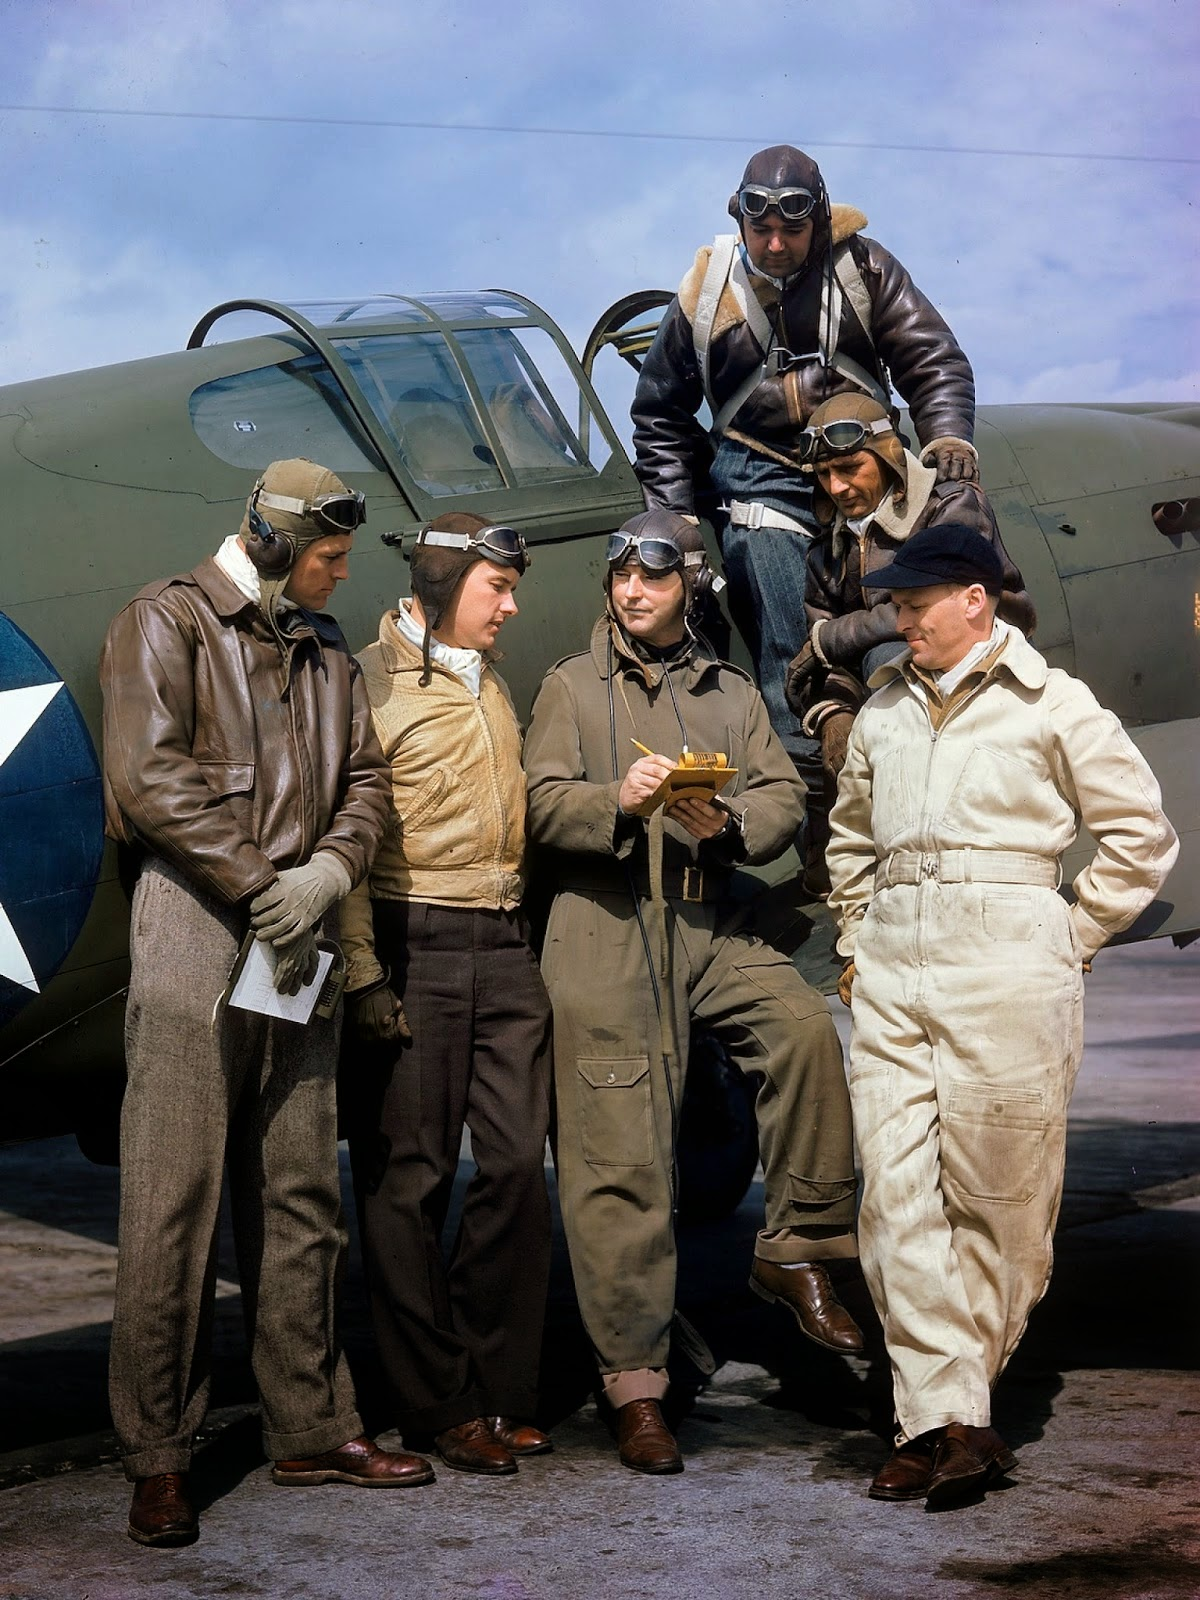 http://1.bp.blogspot.com/-oQr4ucNQATo/VLabbZqbImI/AAAAAAABOLQ/JgabFkoMZCI/s1600/Rare+Color+Photographs+from+World+War+II+(22).jpg